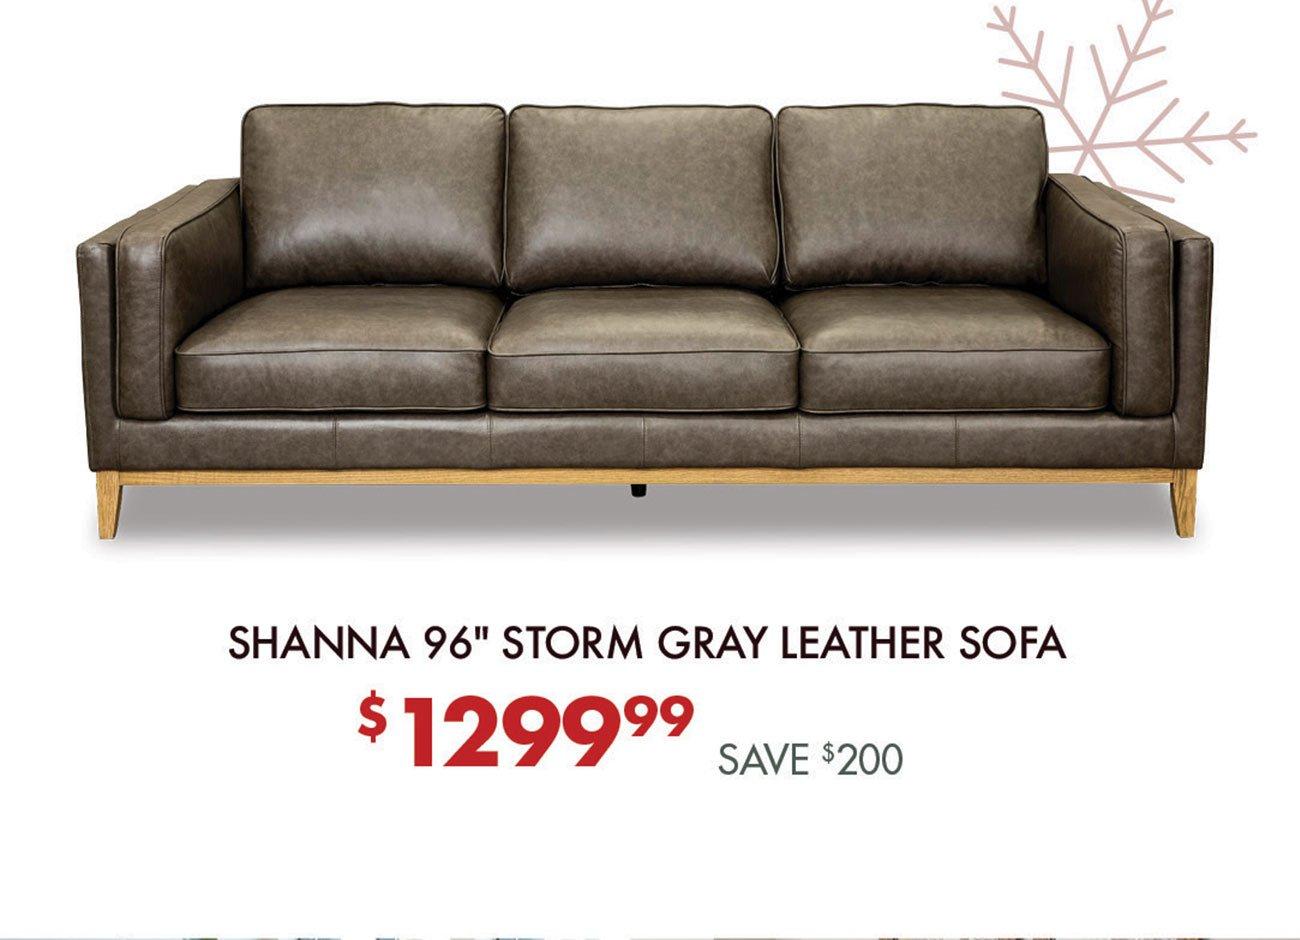 Shanna-Storm-Gray-Leather-Sofa